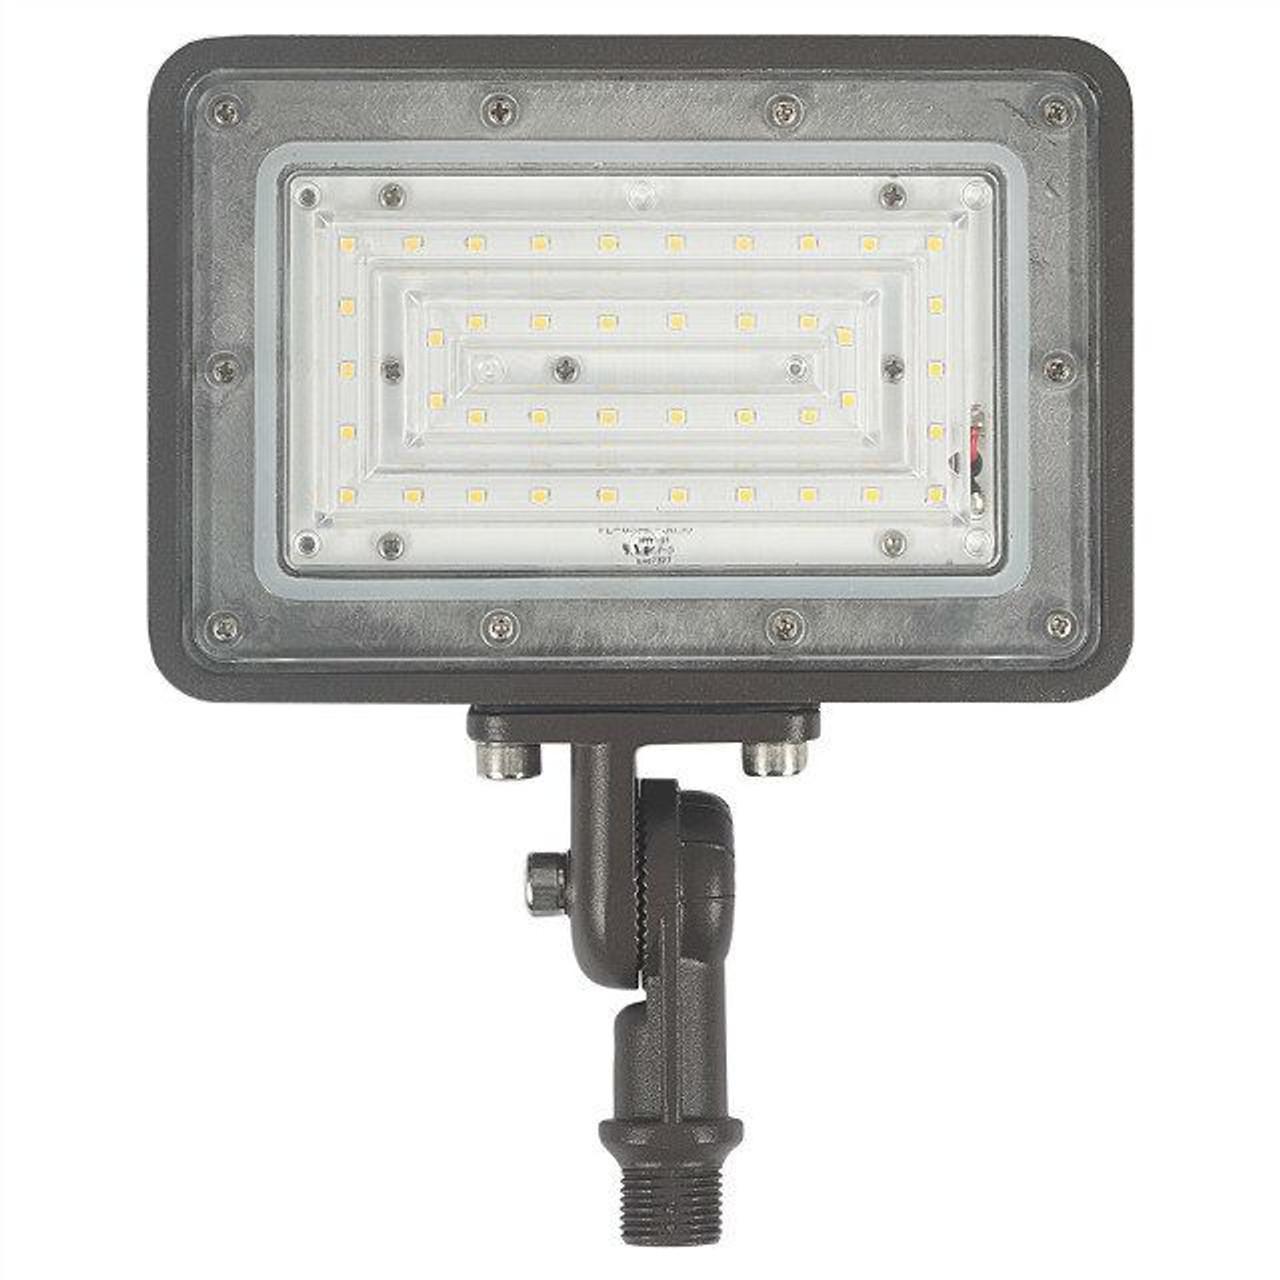 30W LED Flood Lighting with Knuckle